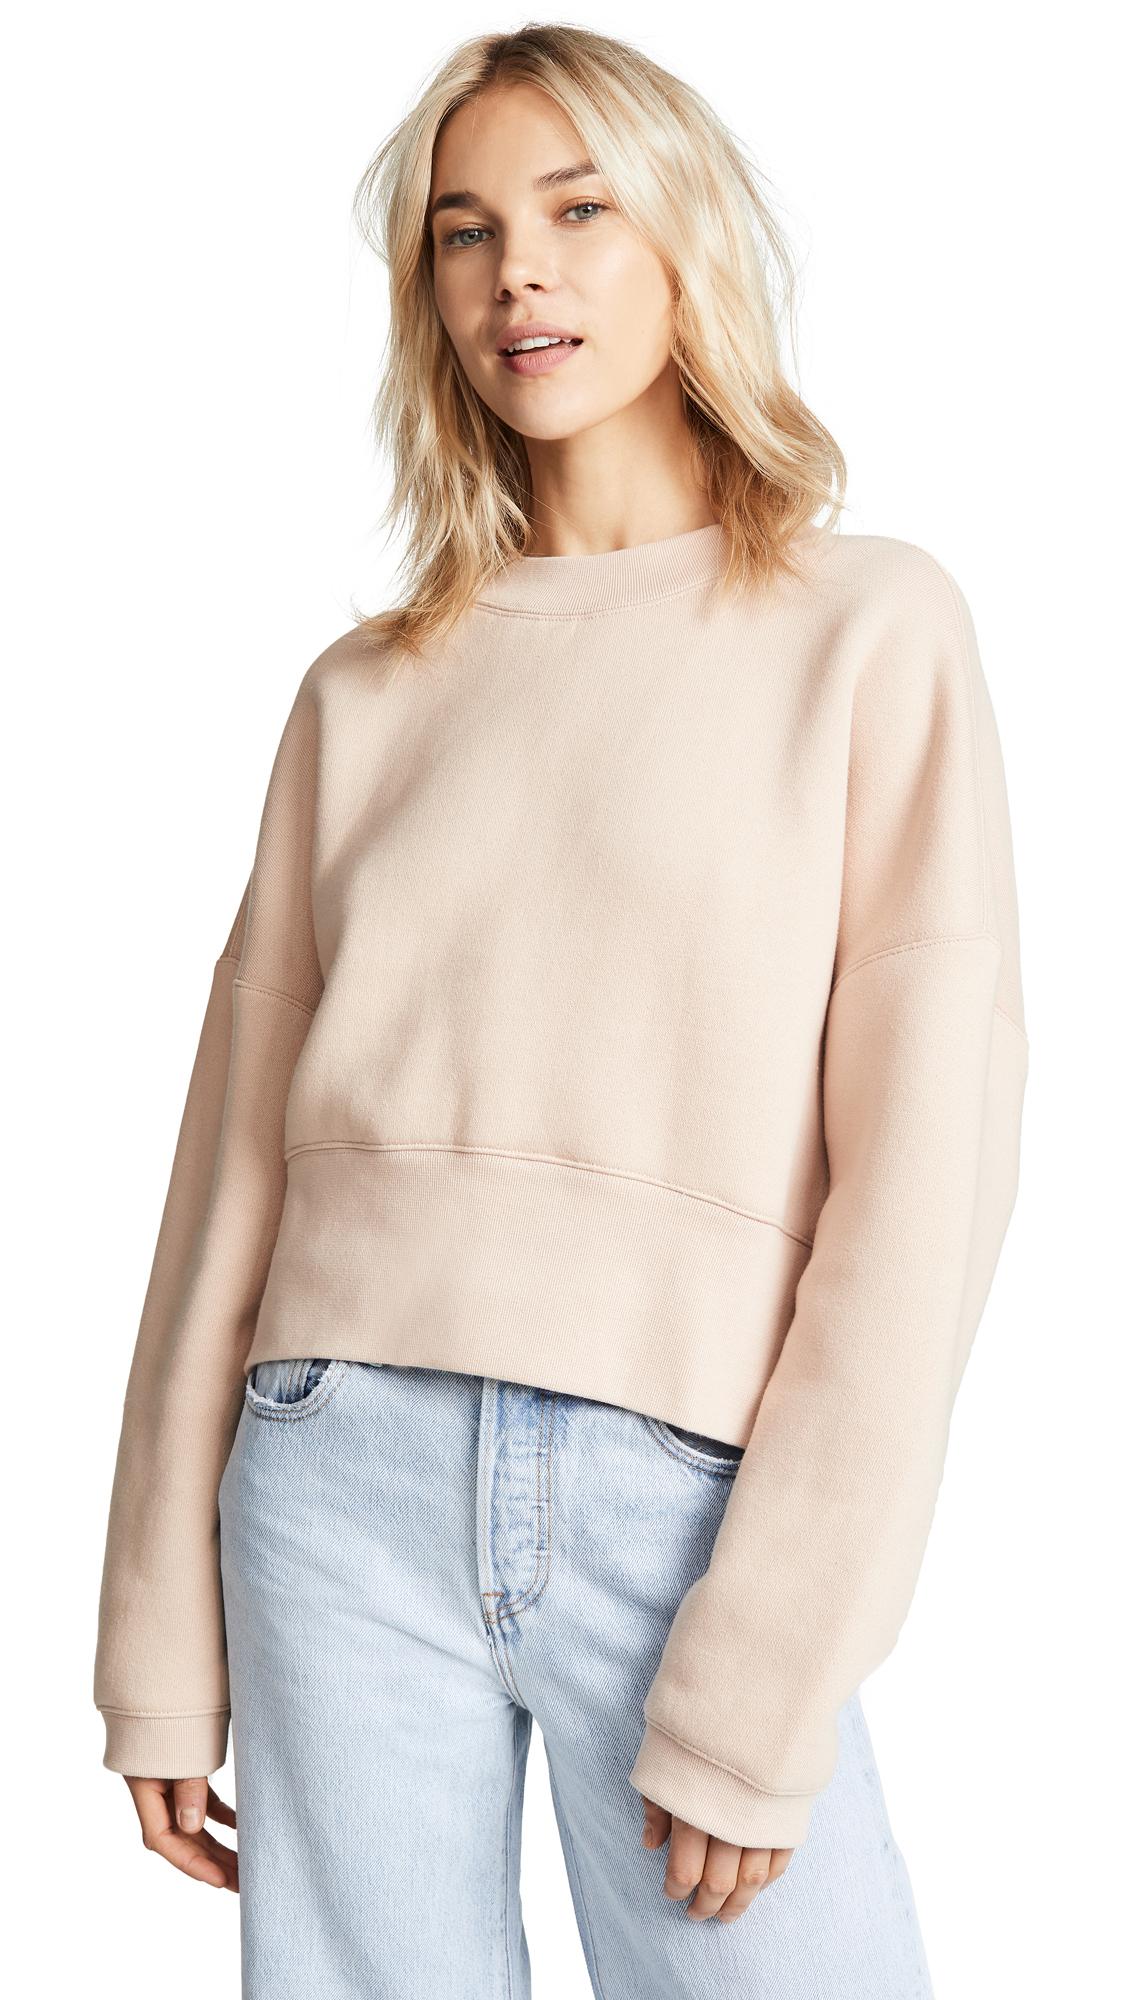 T by Alexander Wang Wide Neck Sweatshirt In Apricot